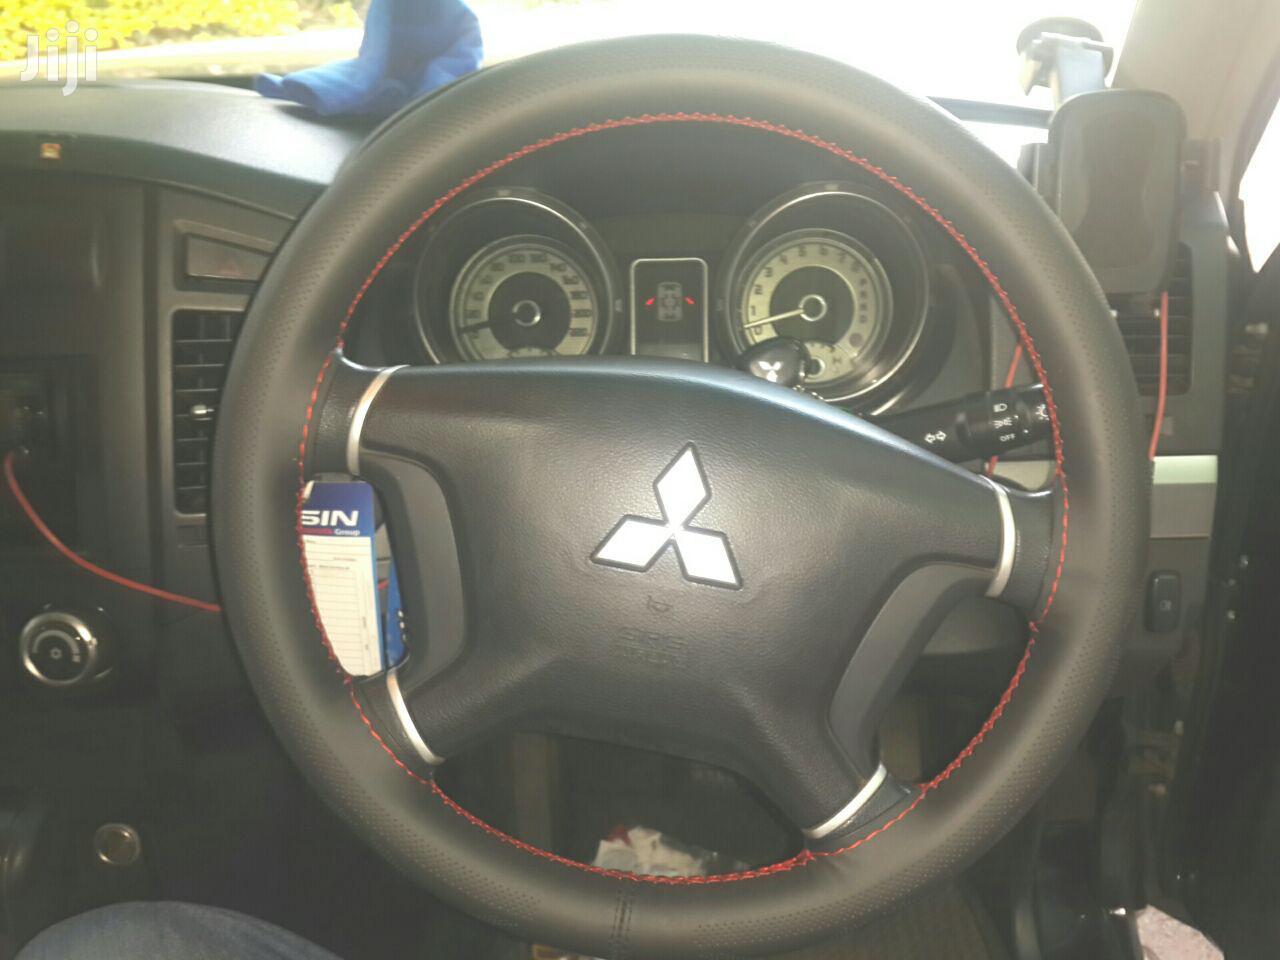 Hand Stitched Steering Wheel Cover | Vehicle Parts & Accessories for sale in Maringo/Hamza, Nairobi, Kenya